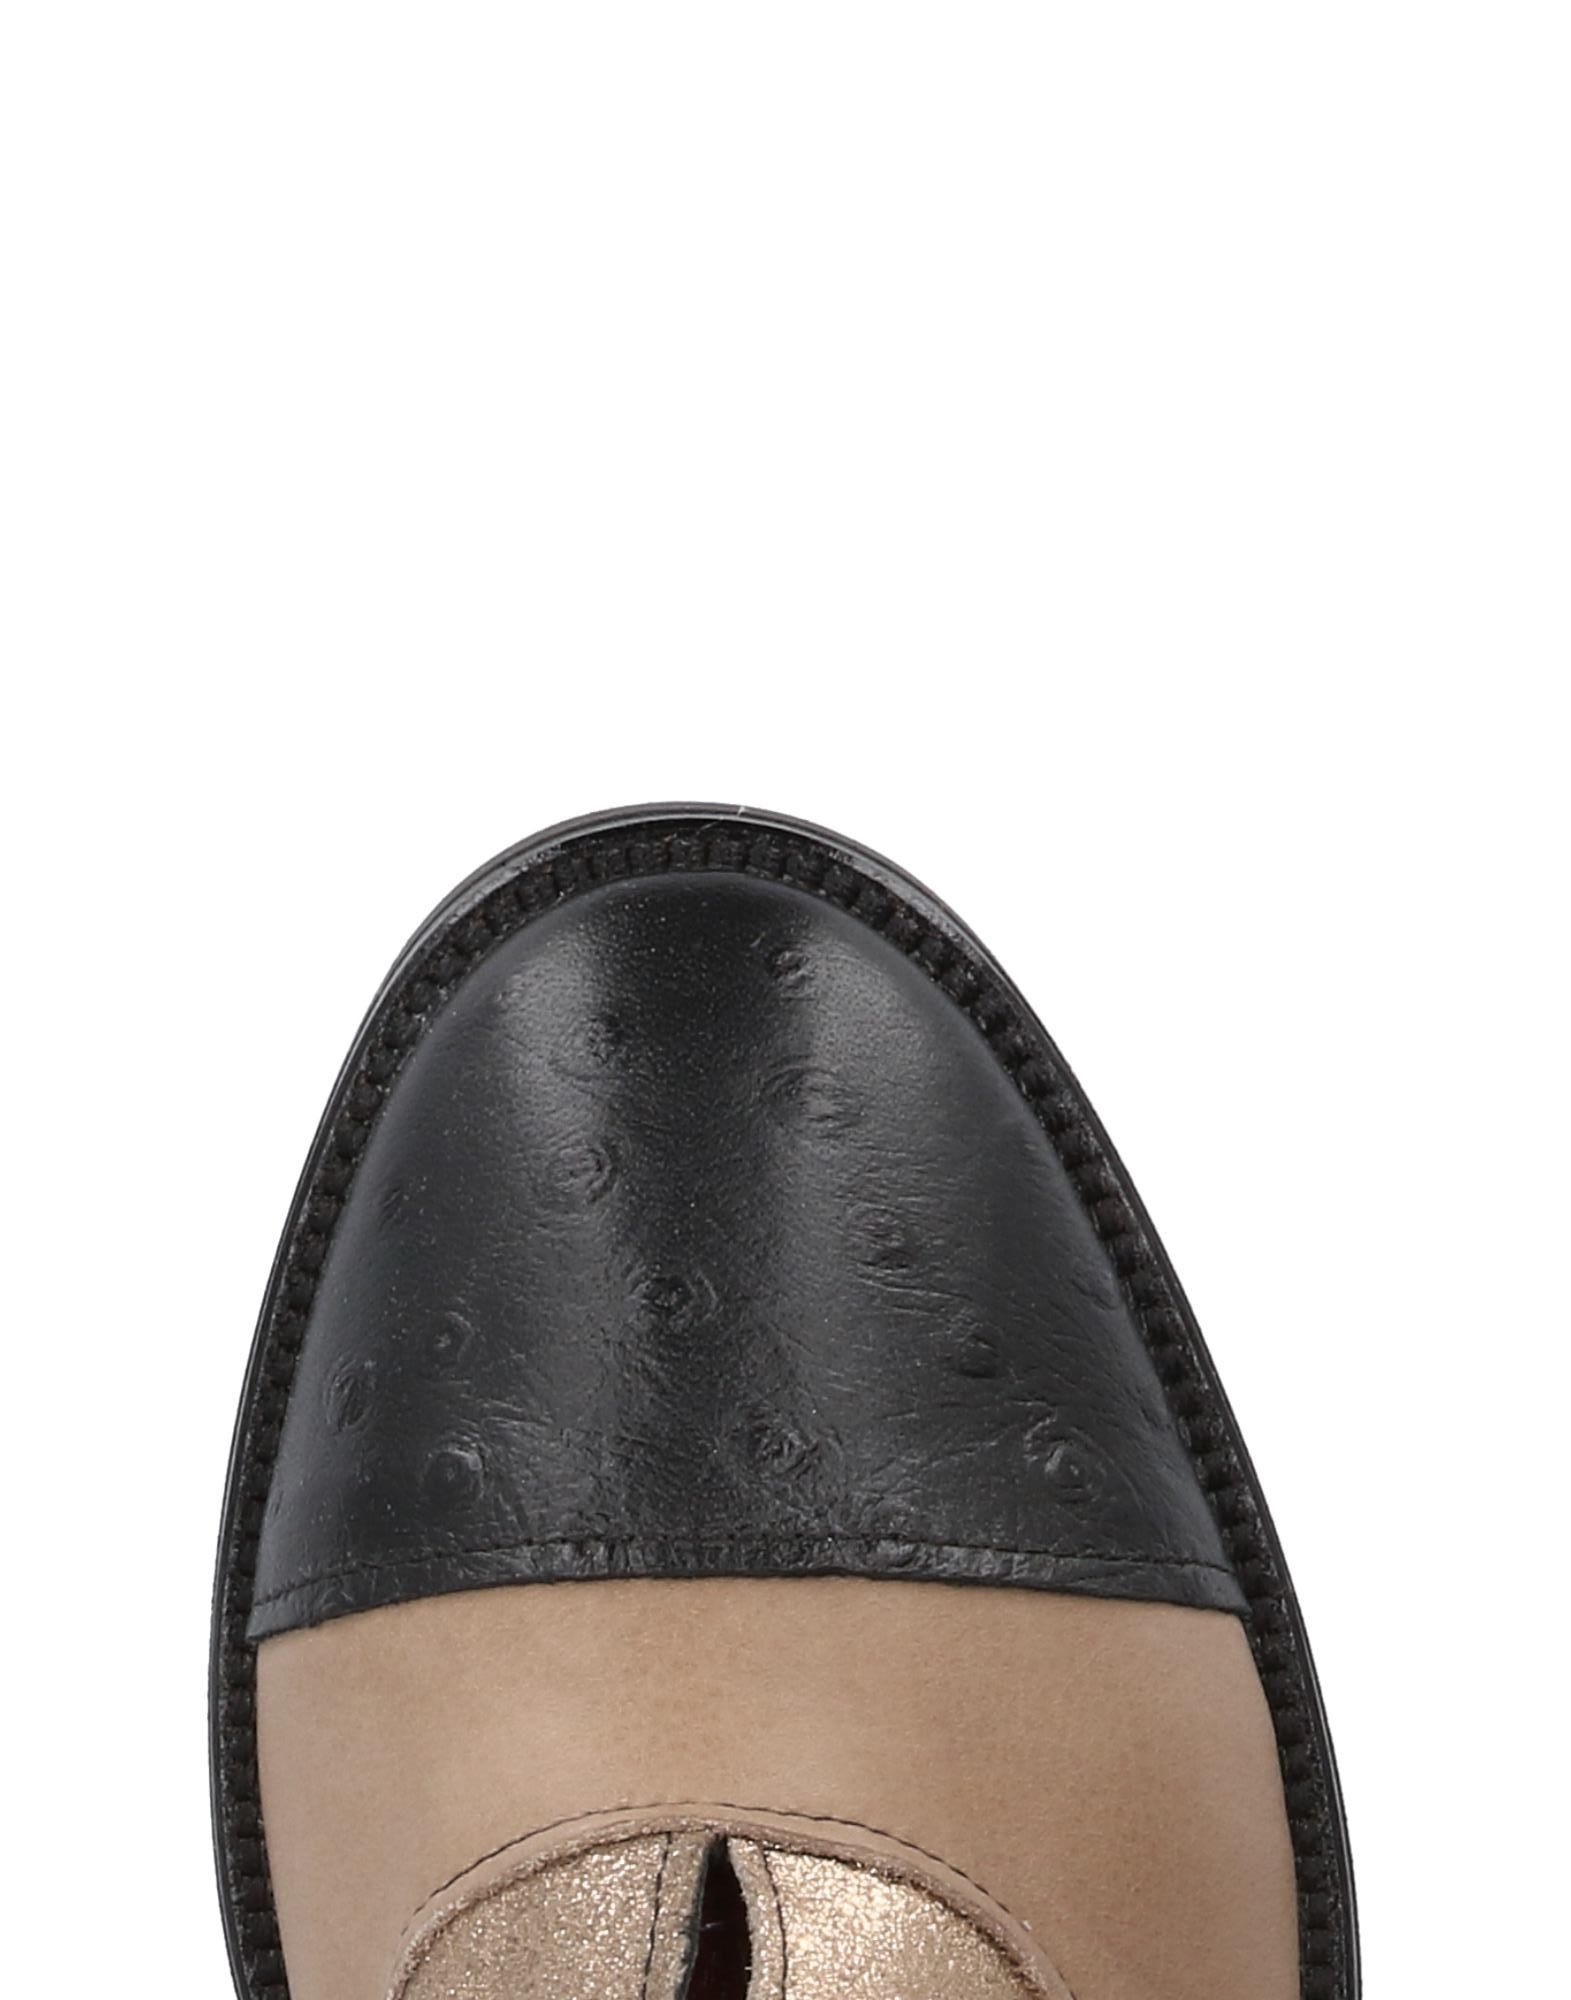 Ebarrito Loafers - Women Ebarrito Ebarrito Ebarrito Loafers online on  United Kingdom - 11458787WN b790f3